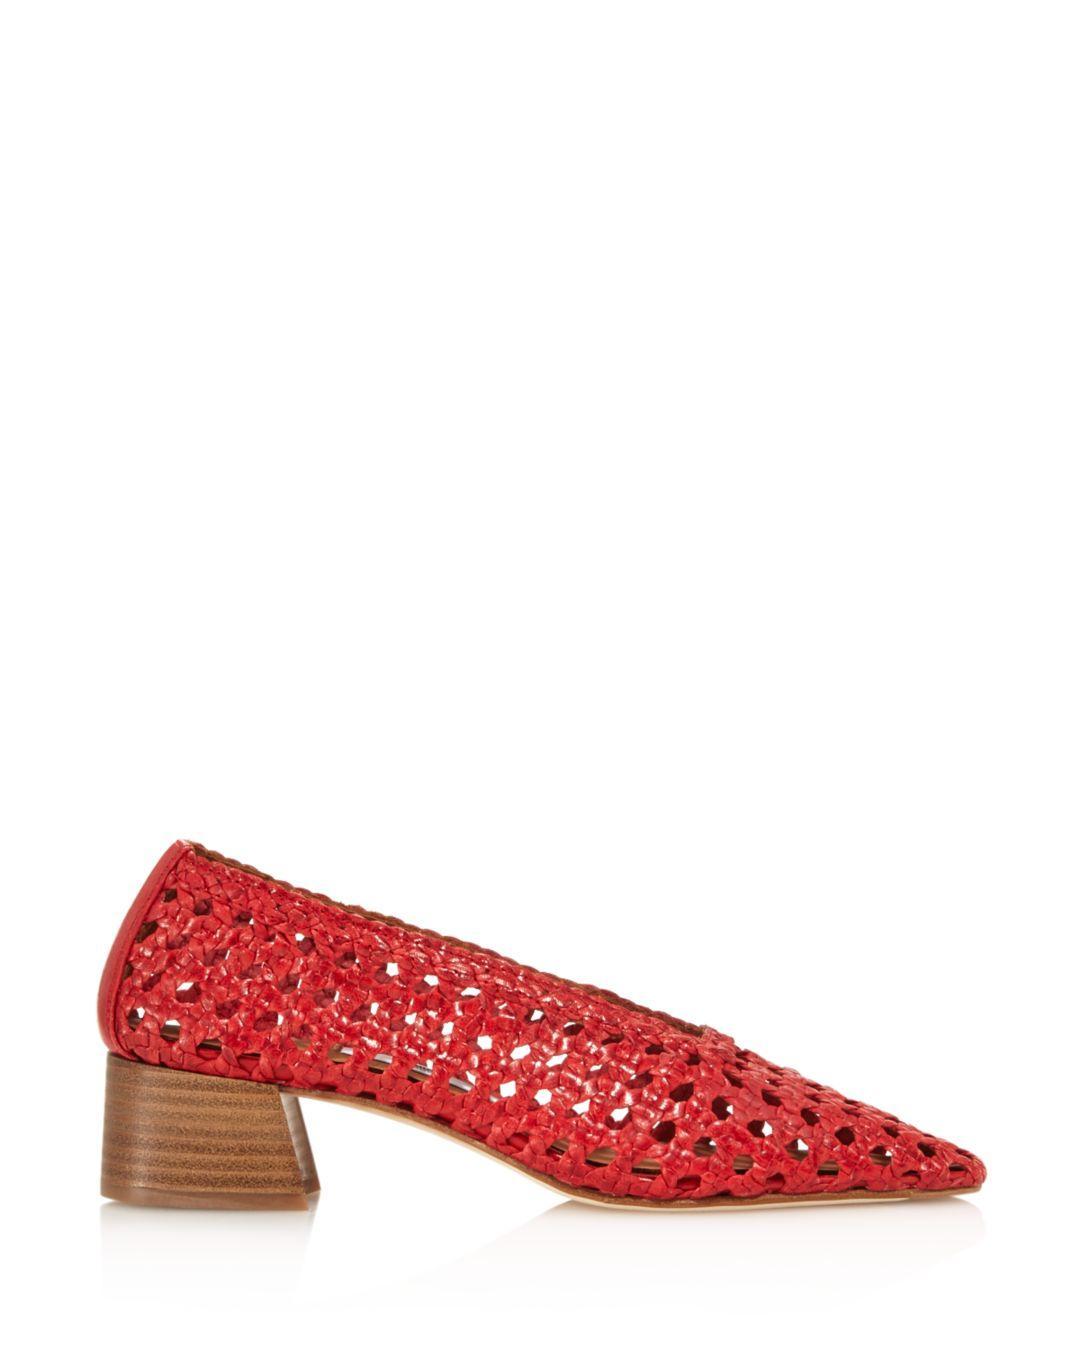 24d37a0065 Lyst - Miista Women's Taissa Woven Leather Pumps in Red